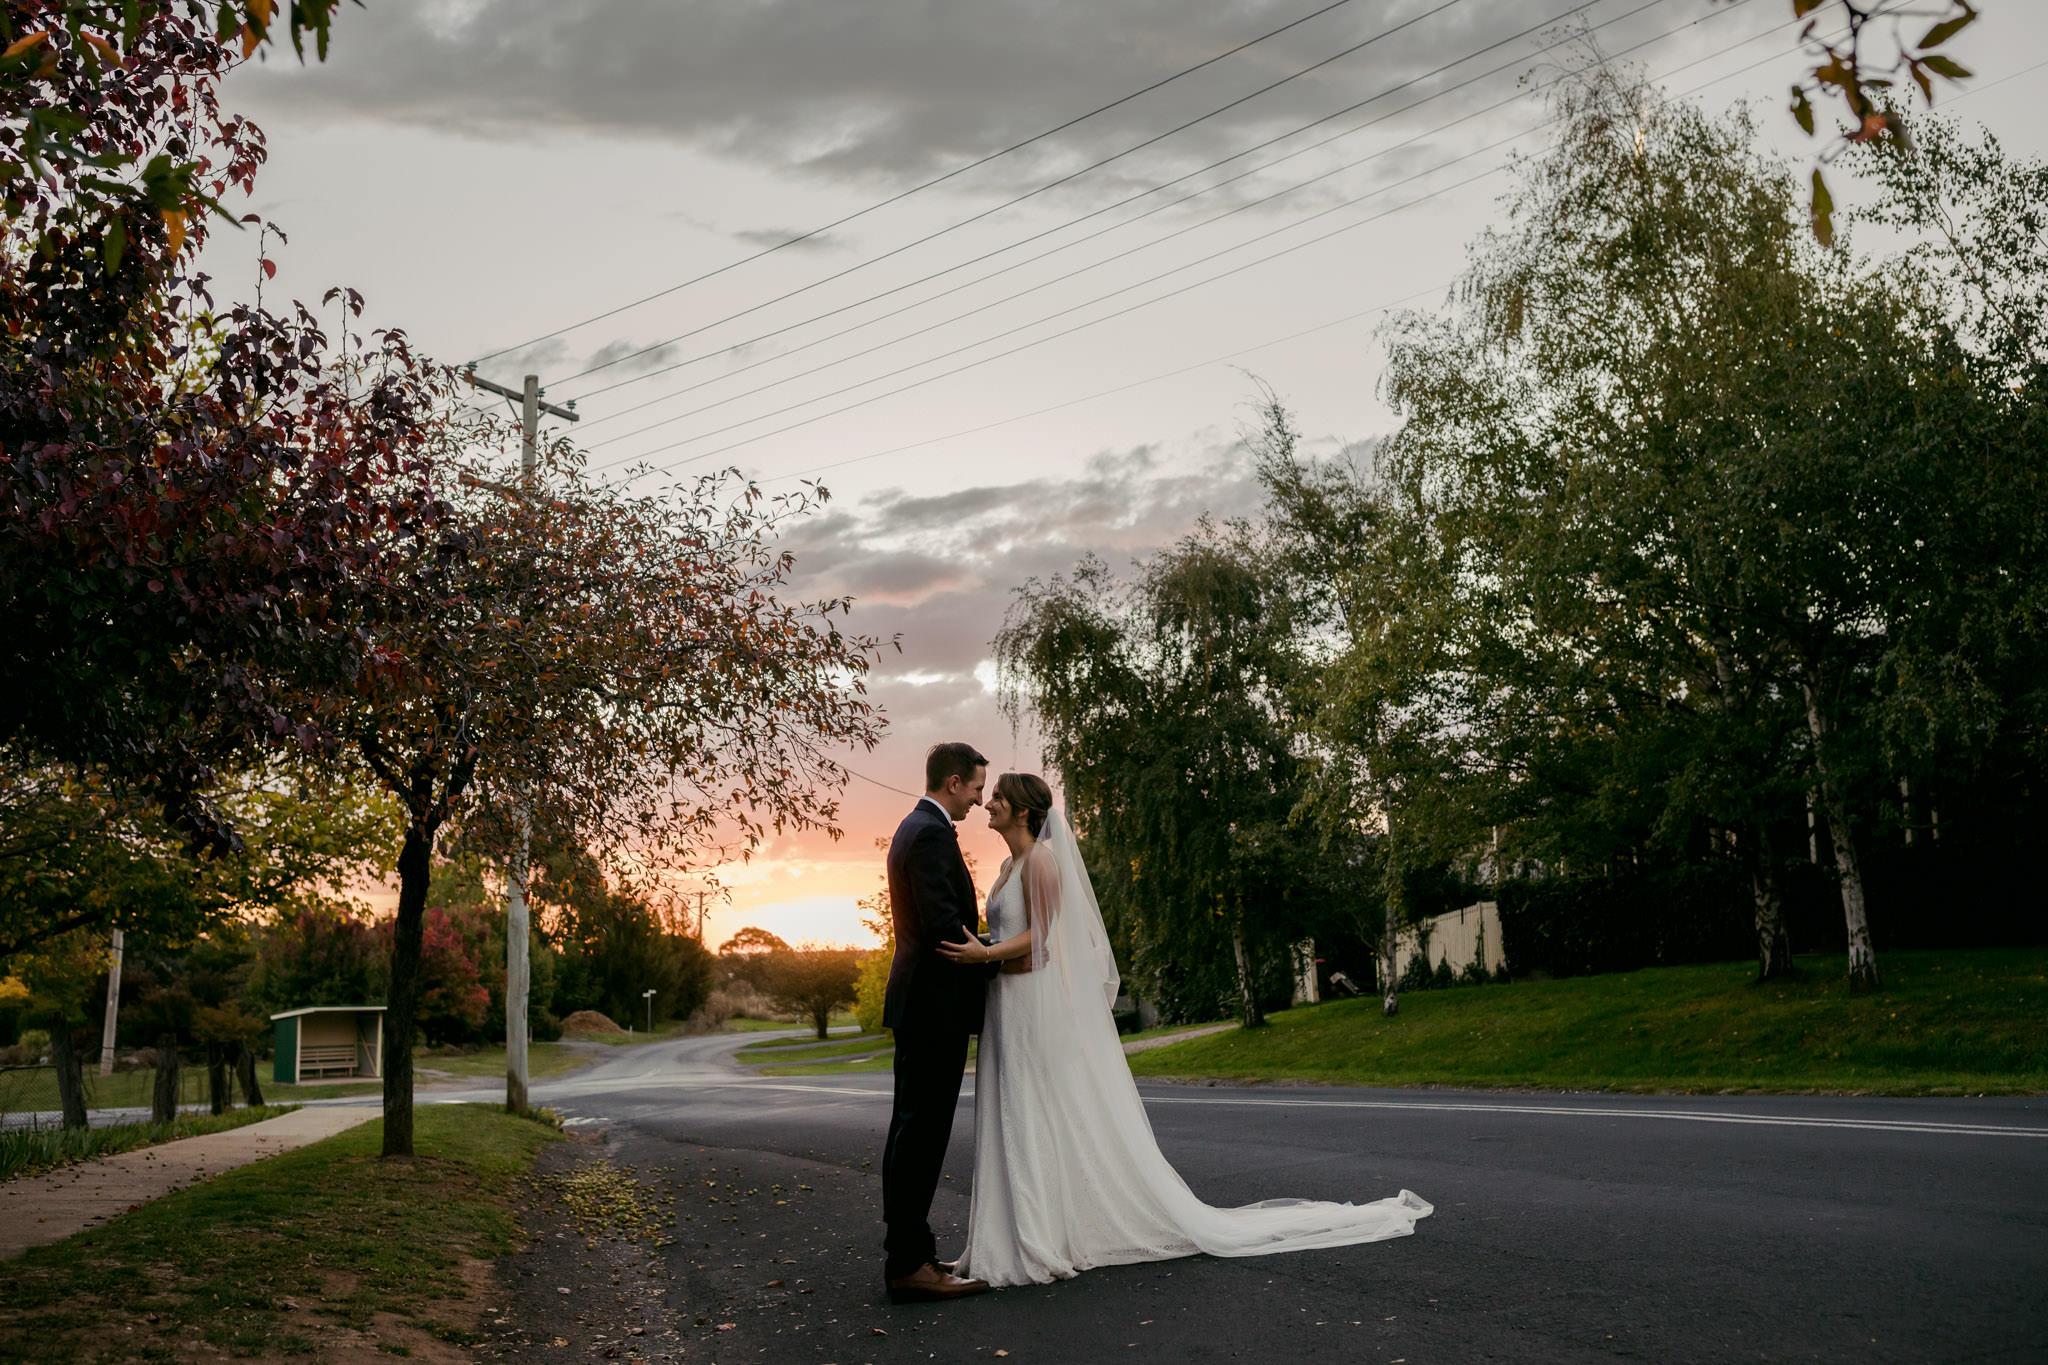 Erin Latimore Mudgee Canberra Wedding Photographer ROSEBANK GUESTHOUSE OLD THEATRE TONIC MILLTHORPE_697.JPG